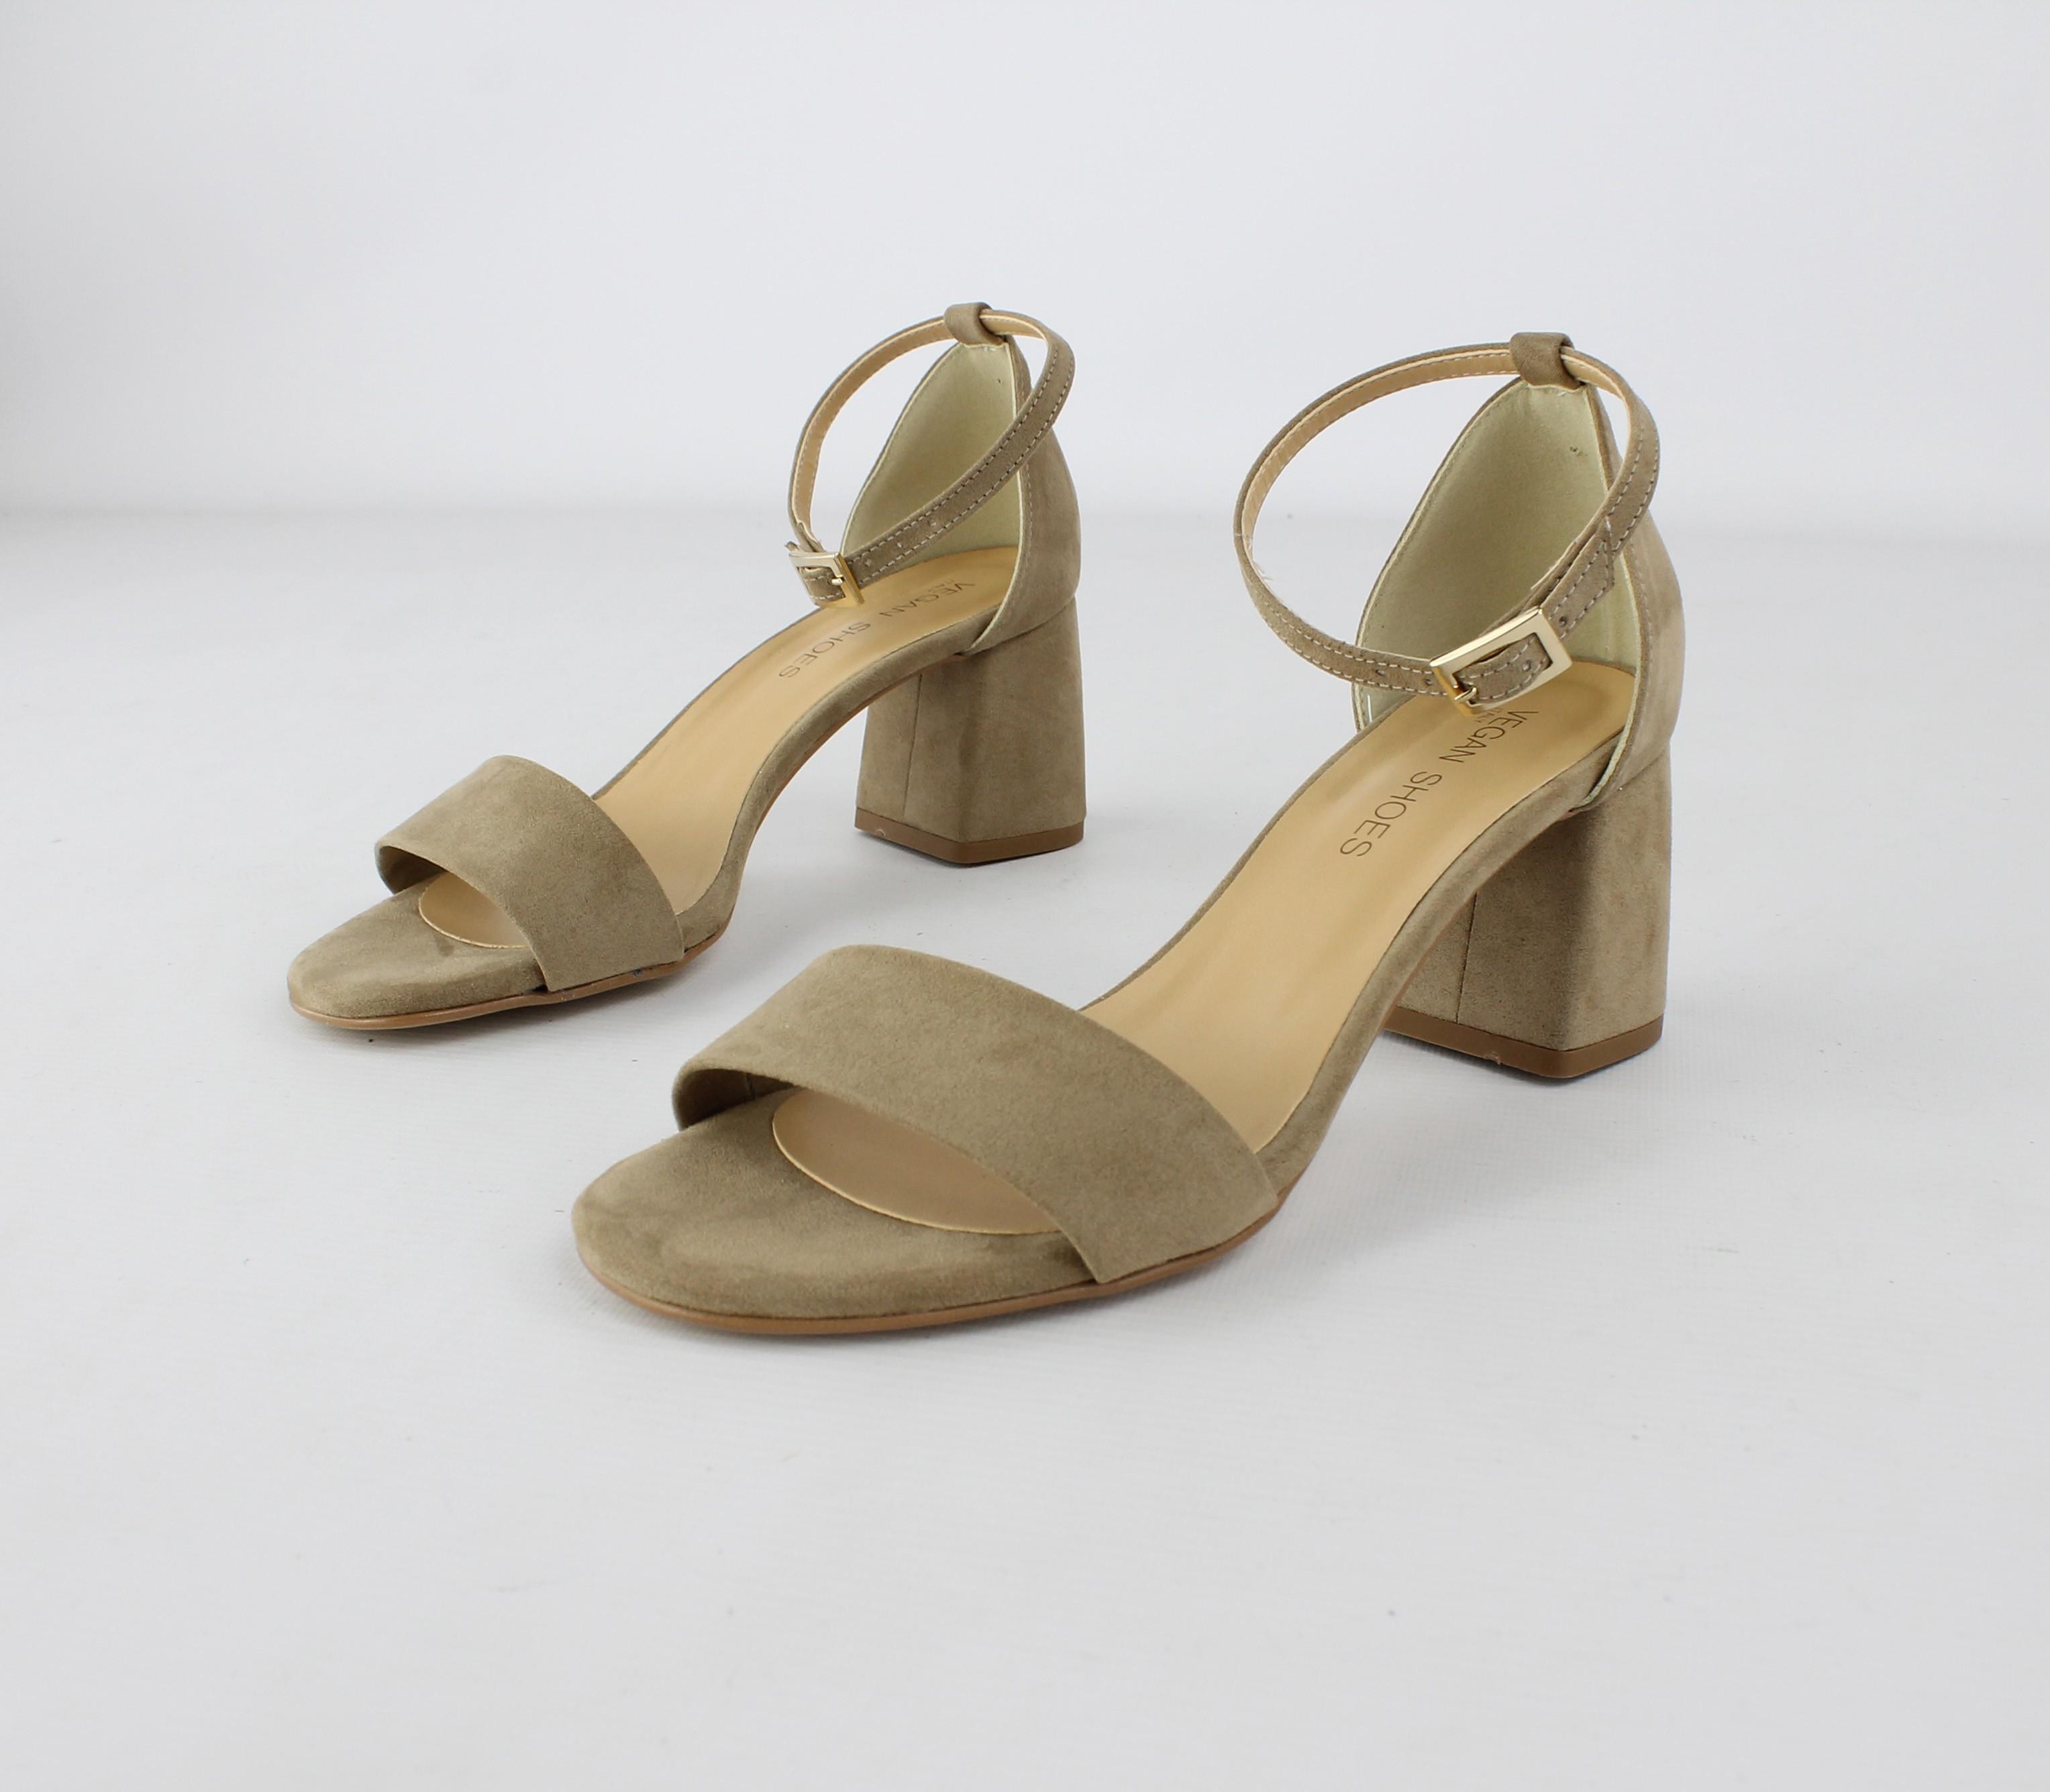 sandali vegan donna beige tacco cinturino